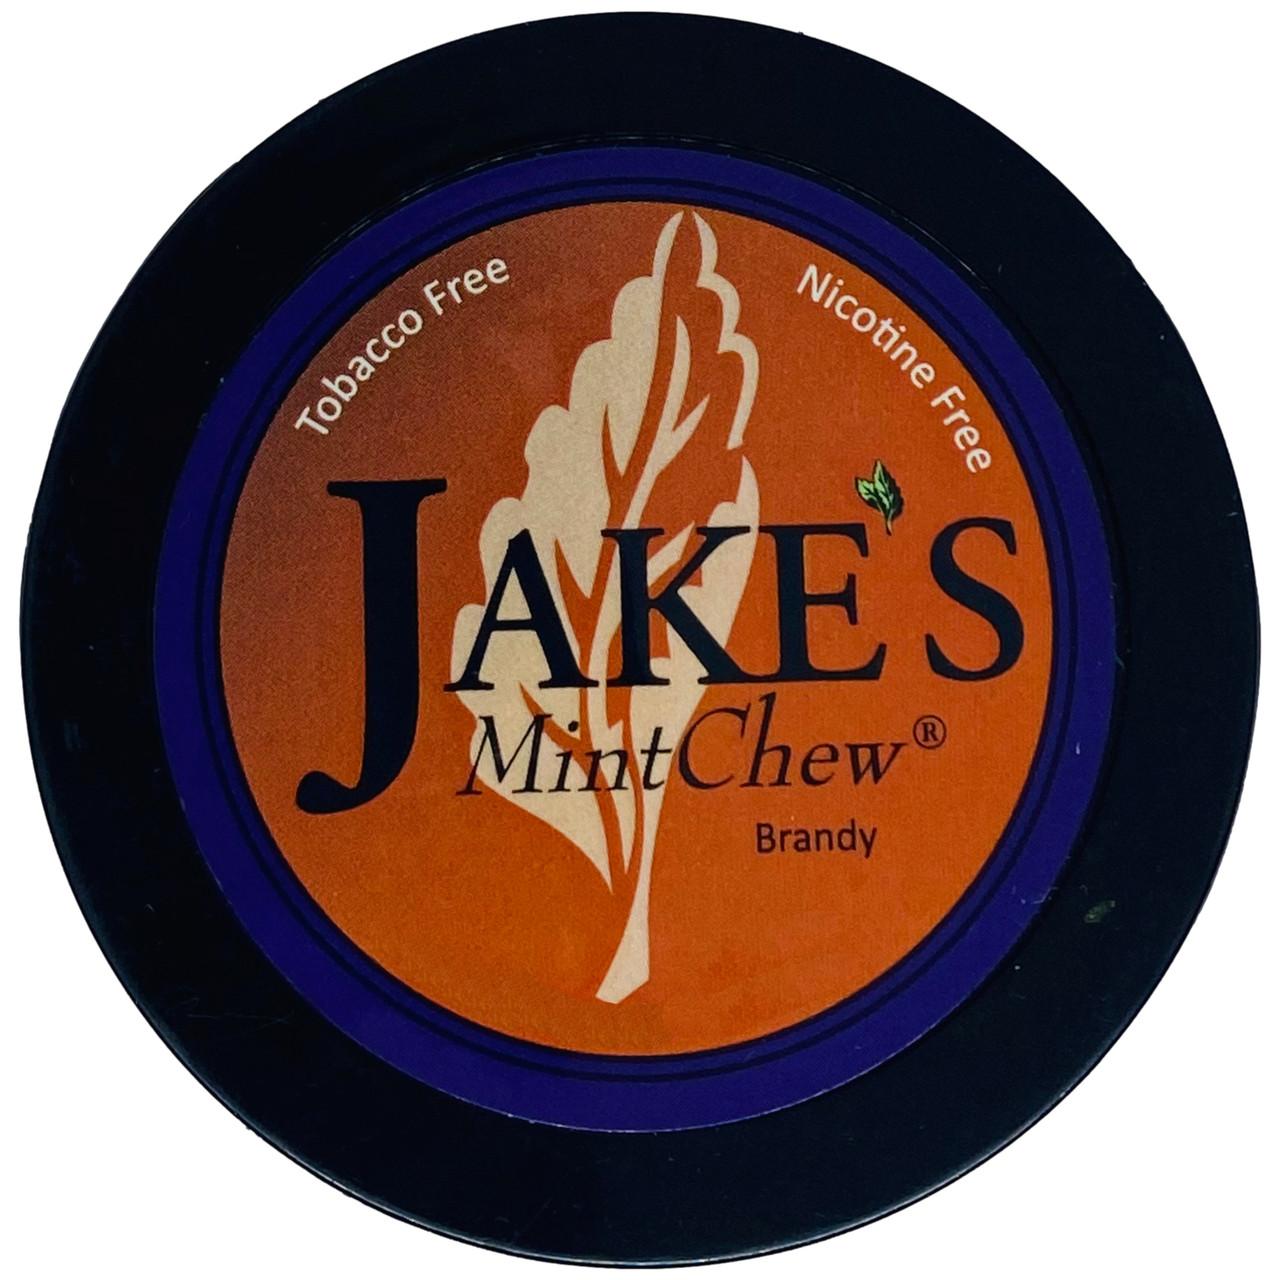 Jake's Mint Chew Brandy 1 Can